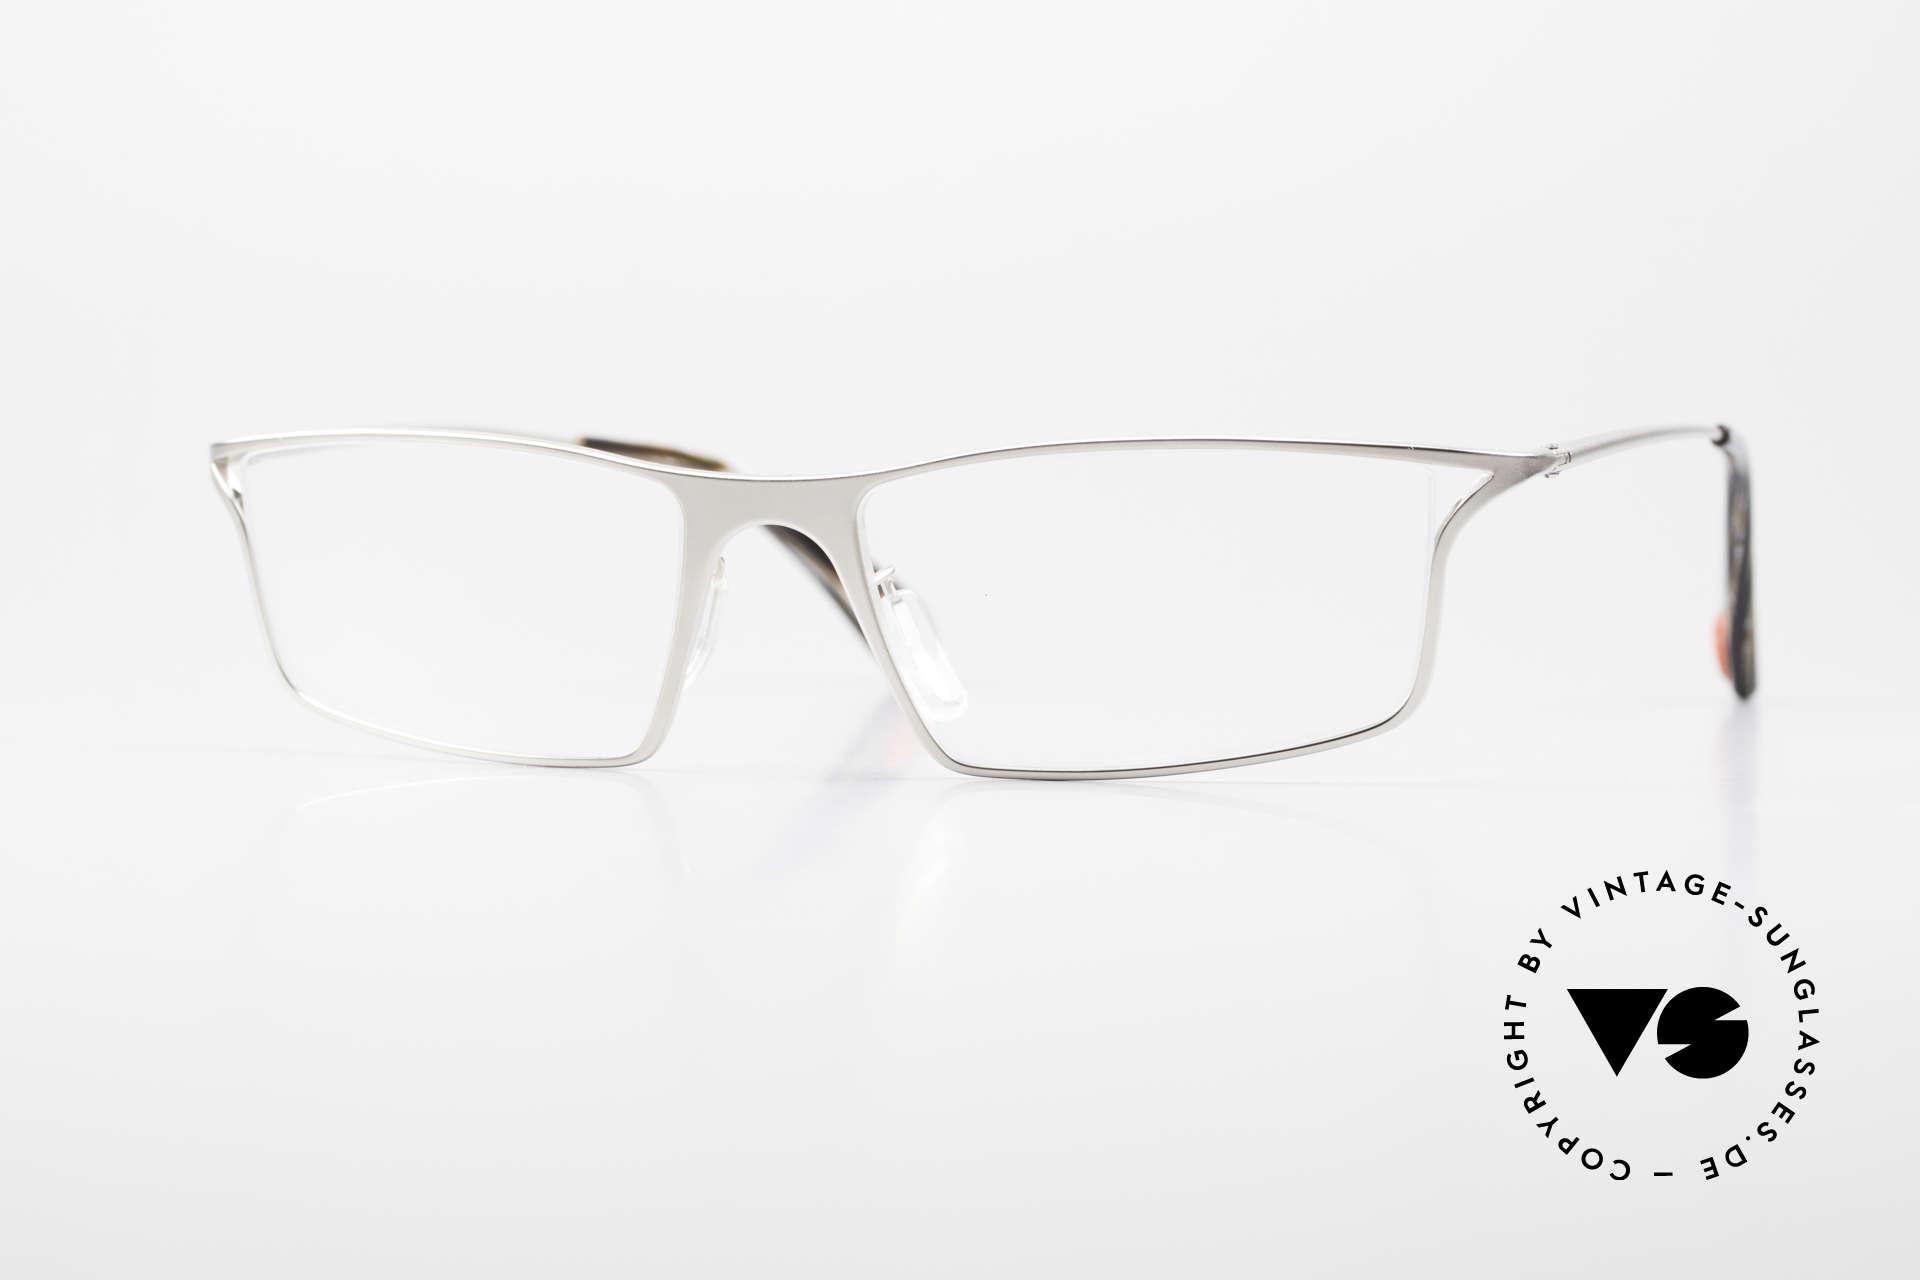 Bugatti 353 Odotype Vintage Luxury Eyeglass Frame, legendary Odotype series for Bugatti fanciers, Made for Men